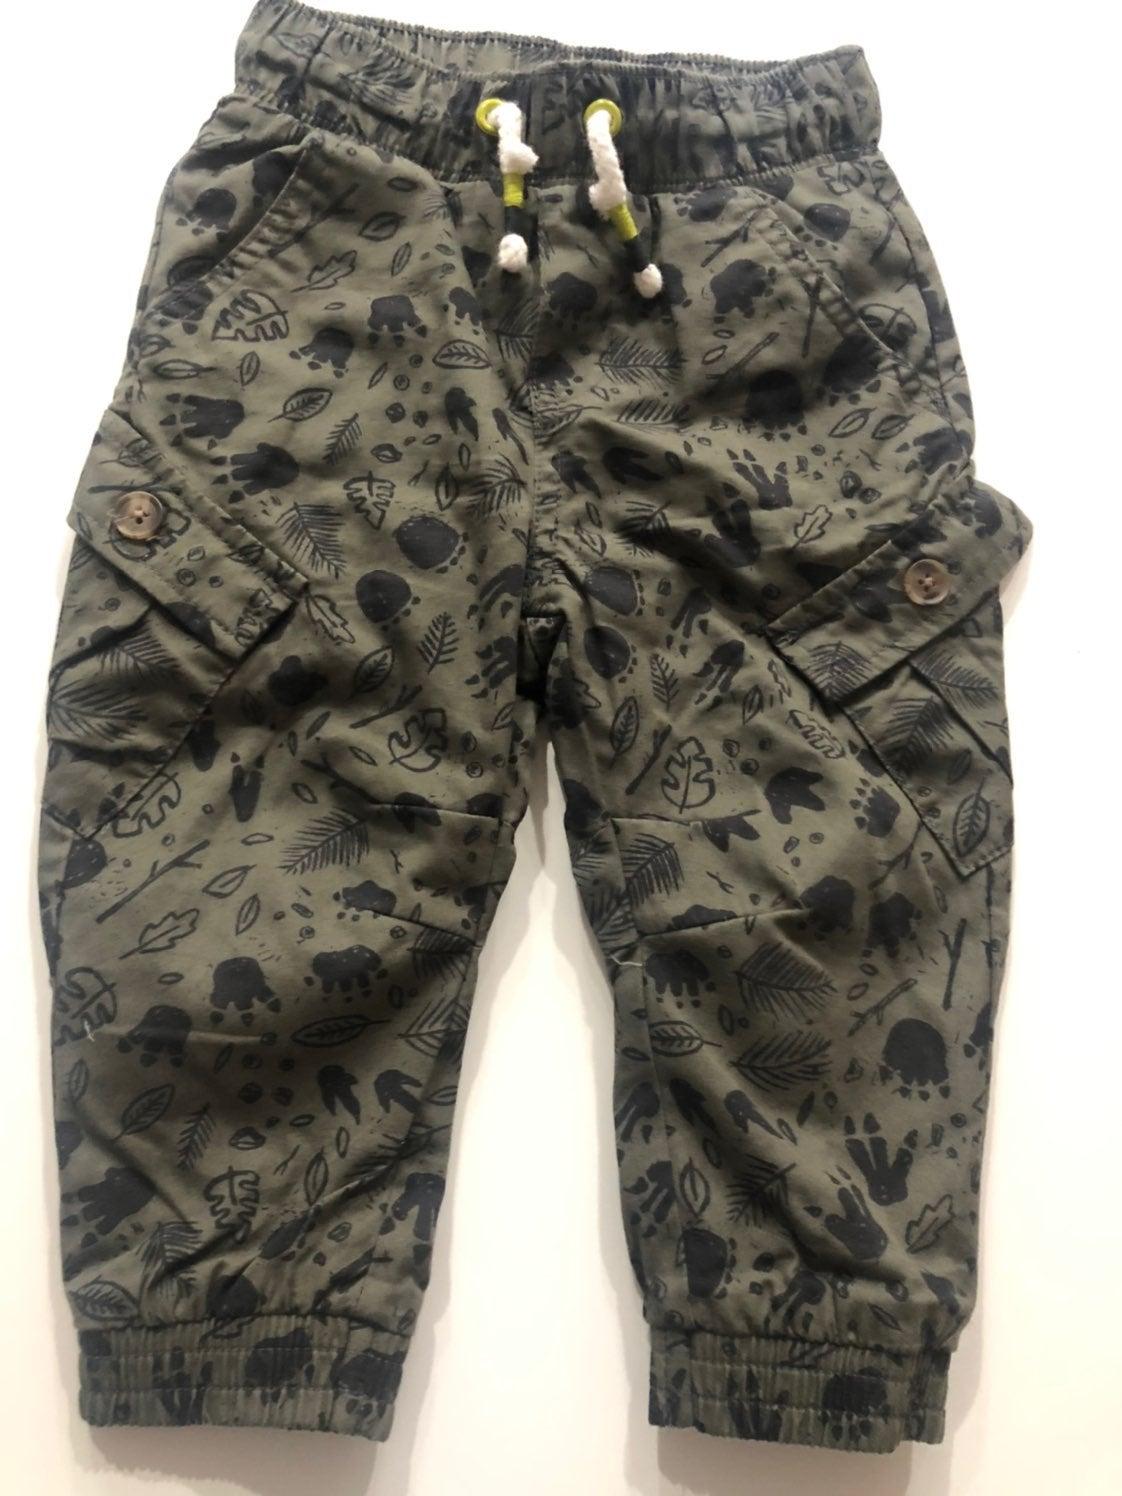 18M dark olive dino cargo pants